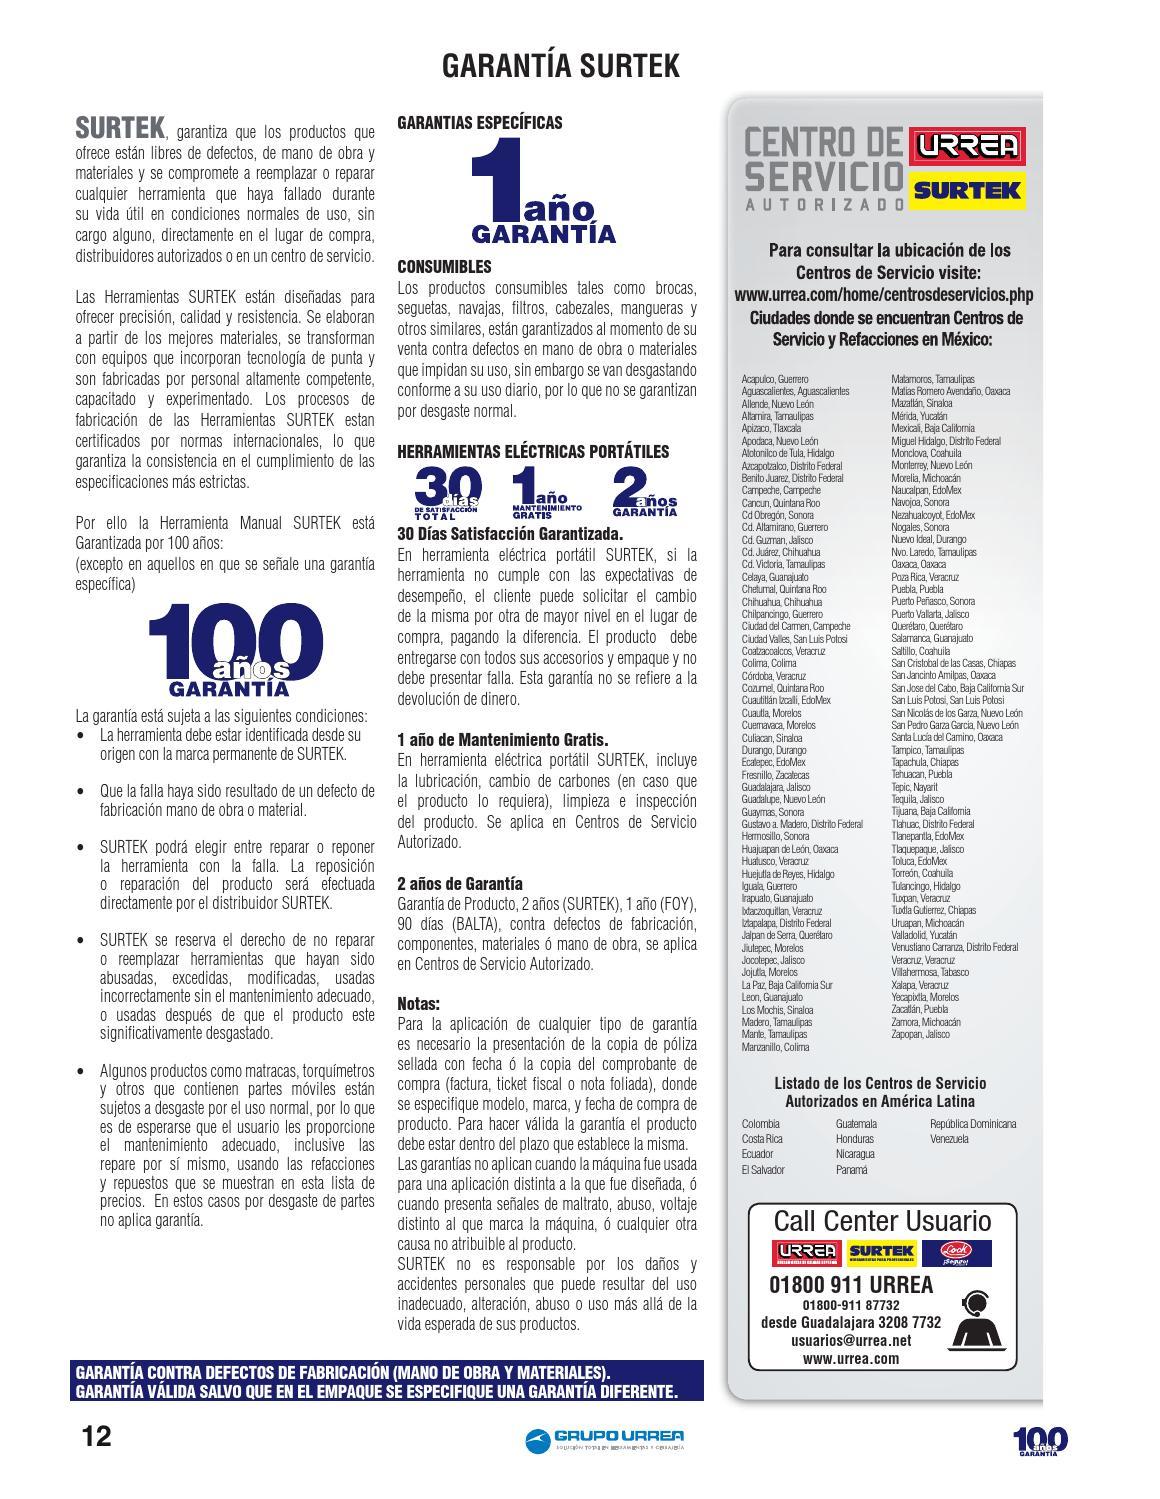 Catalogo De Herramientas Surtek Pdf